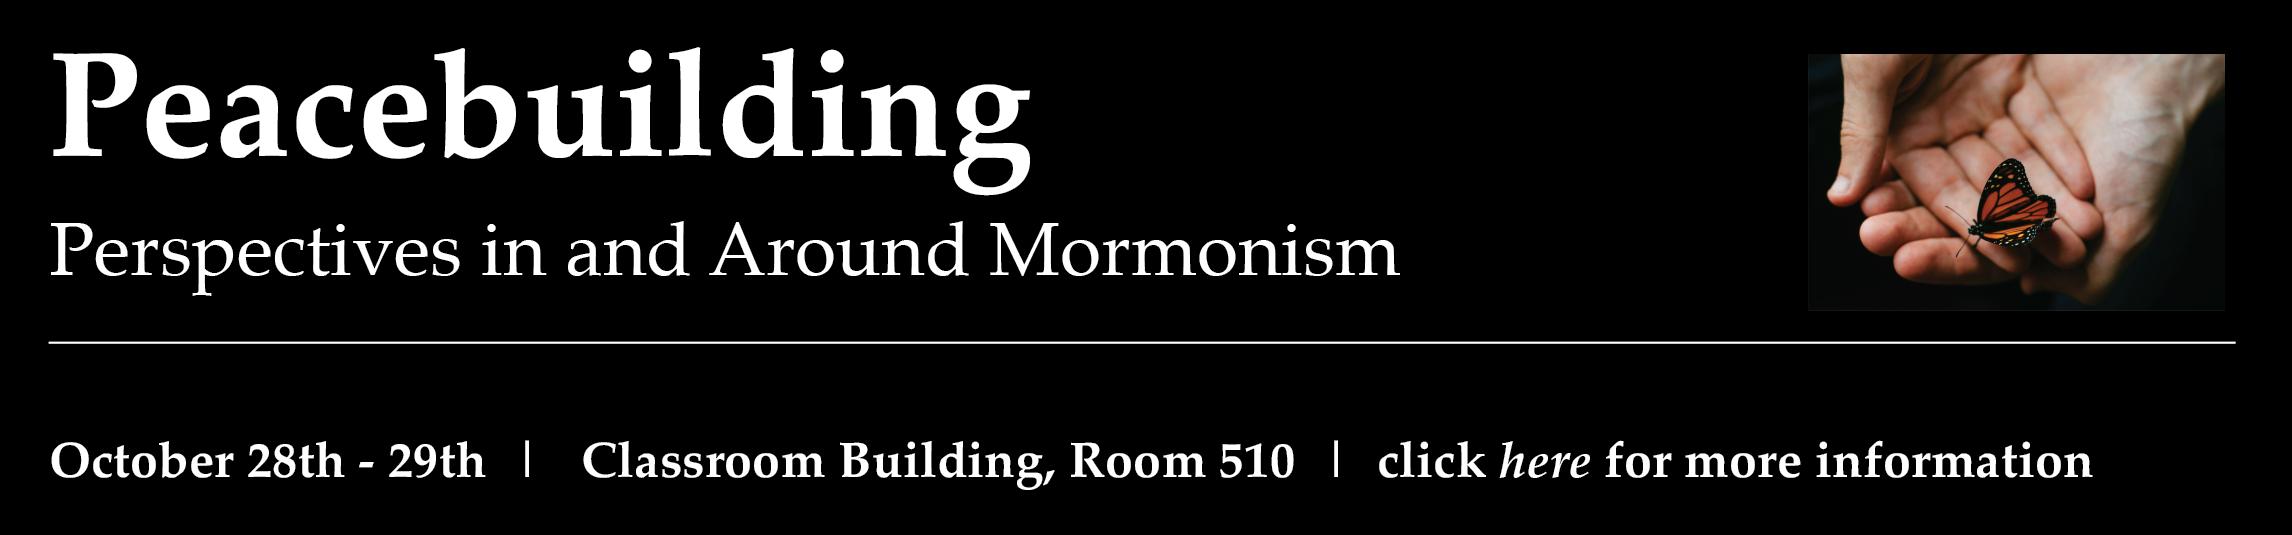 Peacebuilding in and around Mormonism